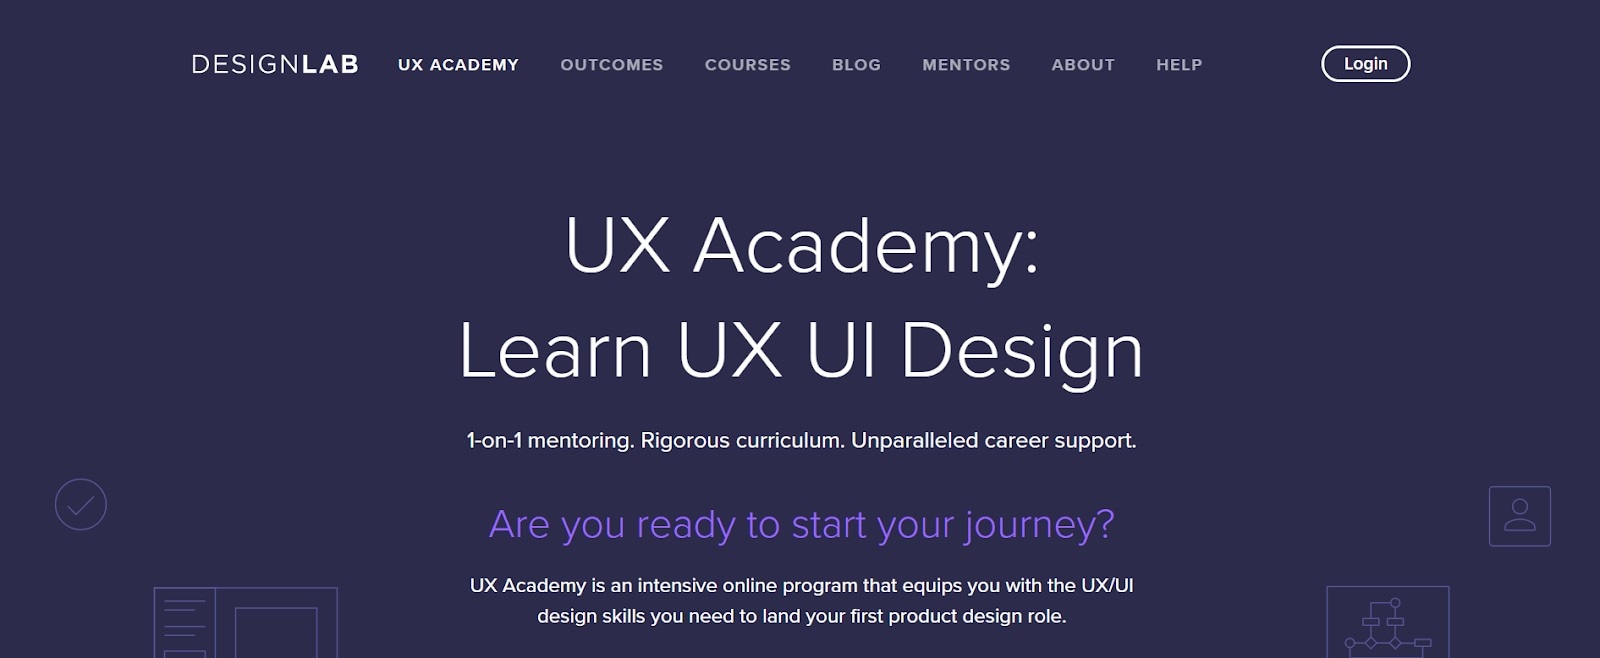 ux bootcamp online